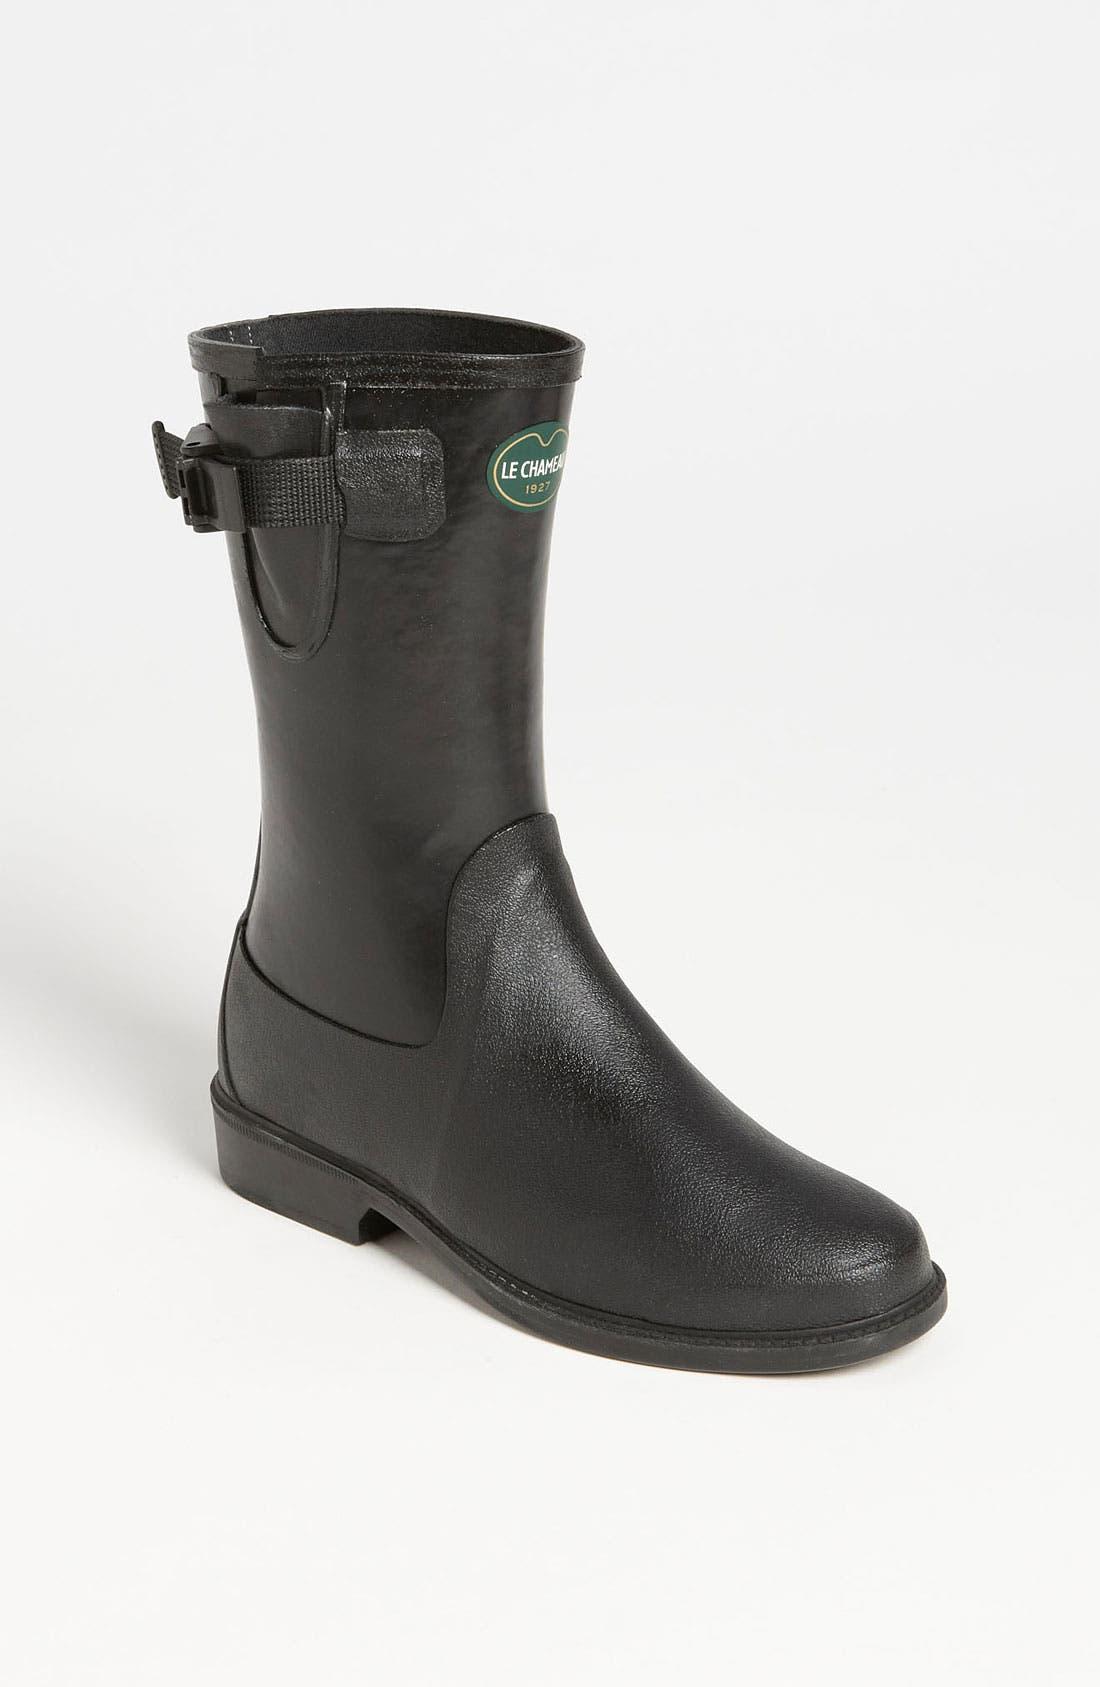 Alternate Image 1 Selected - Le Chameau 'Cavaliere Low' Rain Boot (Women)